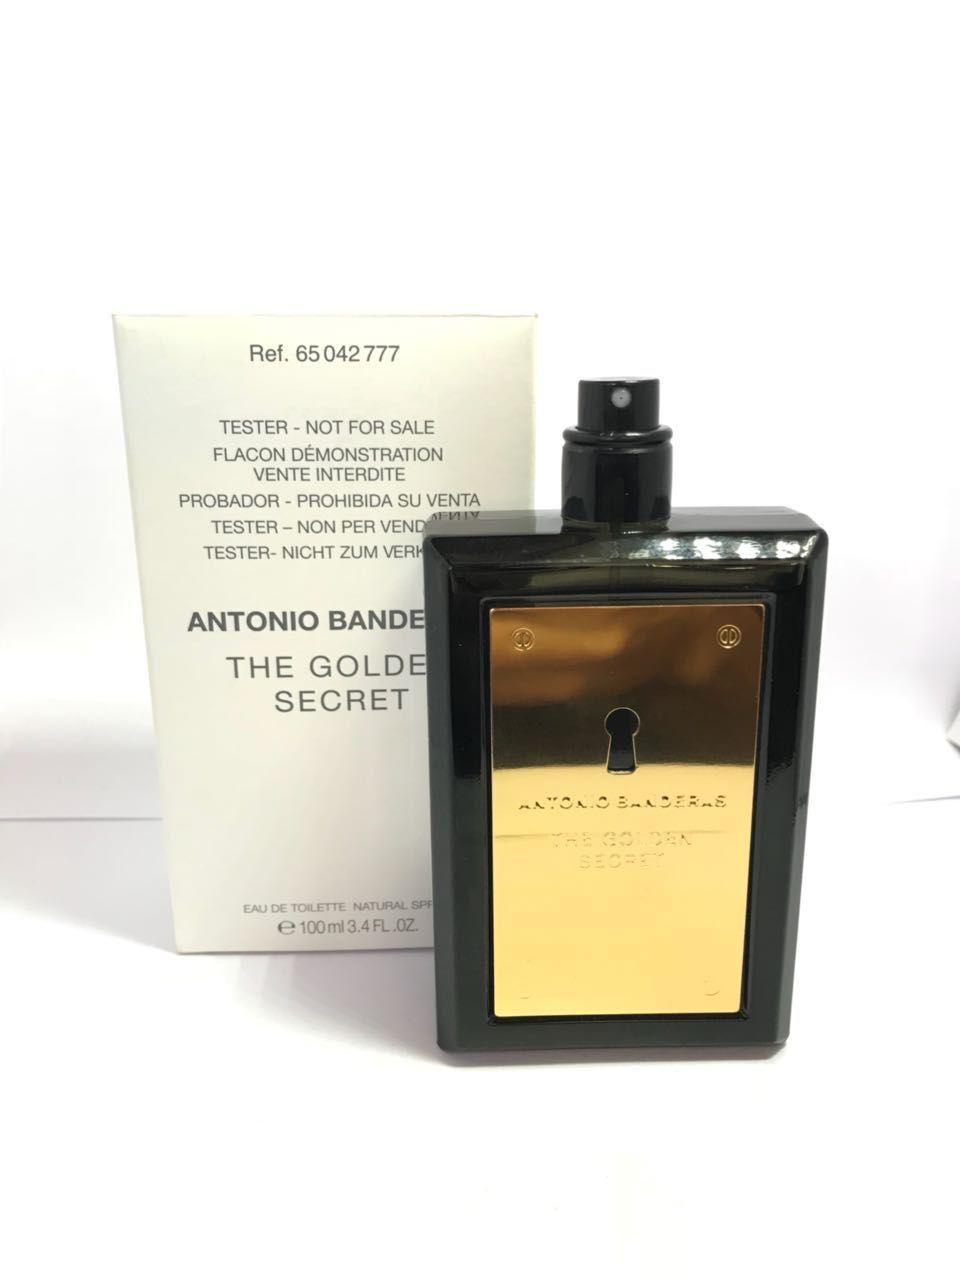 The Golden Secret Antonio Banderas Masculino Eau de Toilette 100ML - Tester